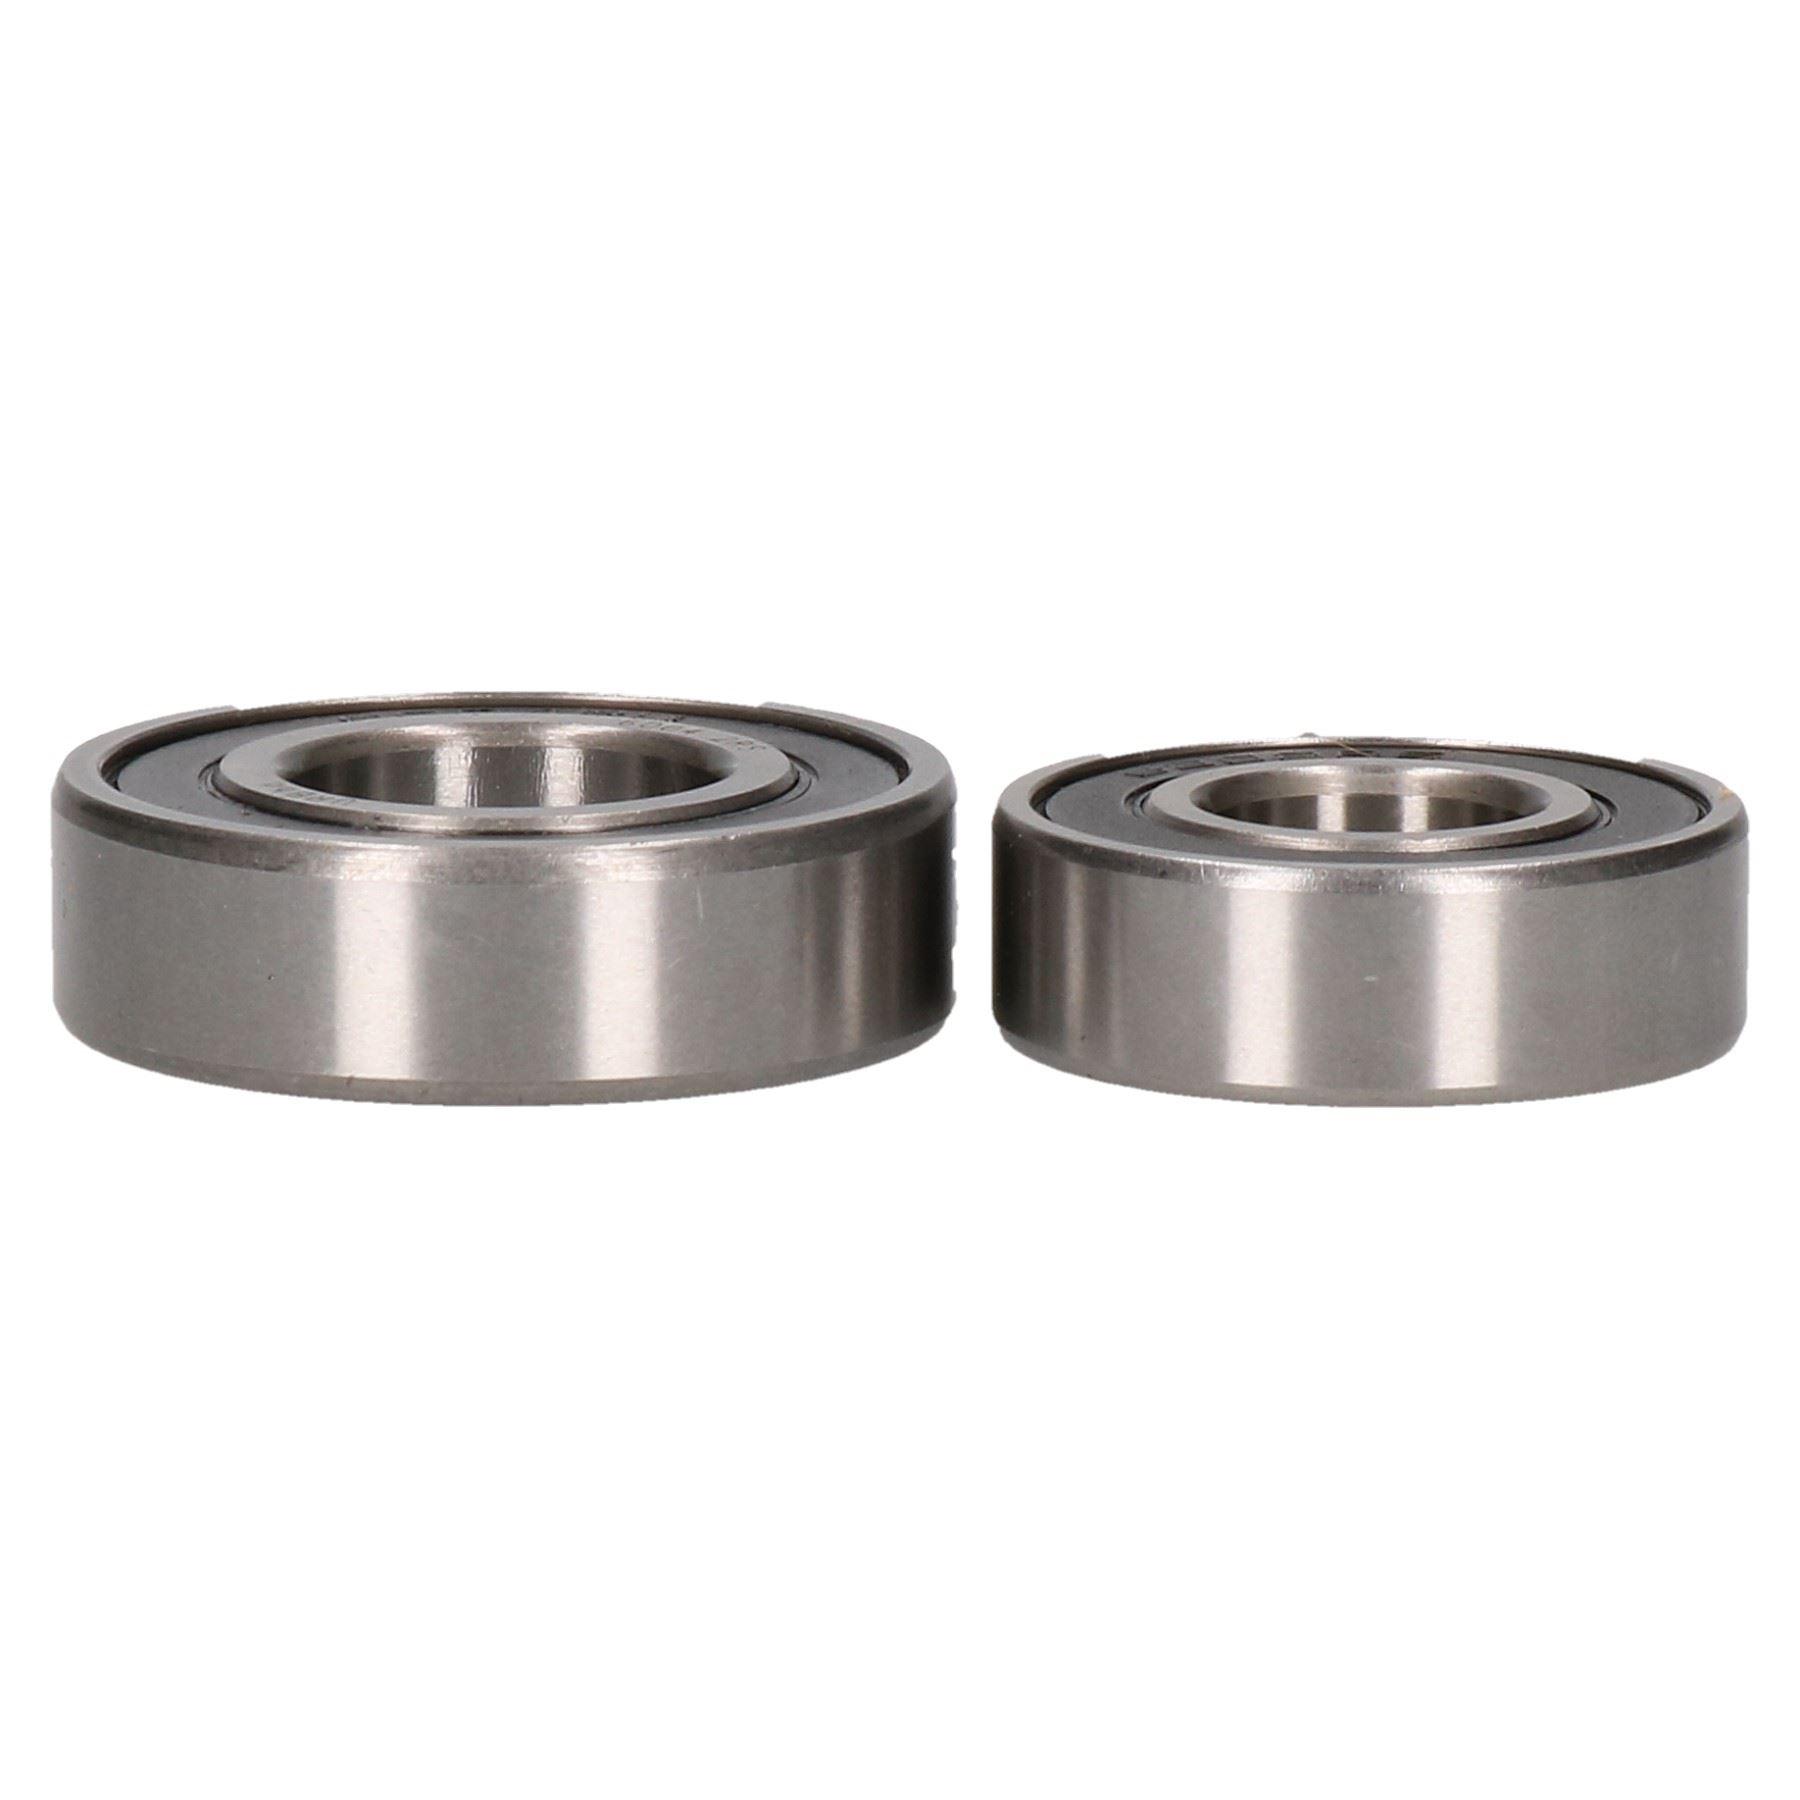 4-ERDE-102-121-122-Trailer-Roller-Wheel-Hub-Bearing-Kits-6206-2RS-6004-2RS thumbnail 4